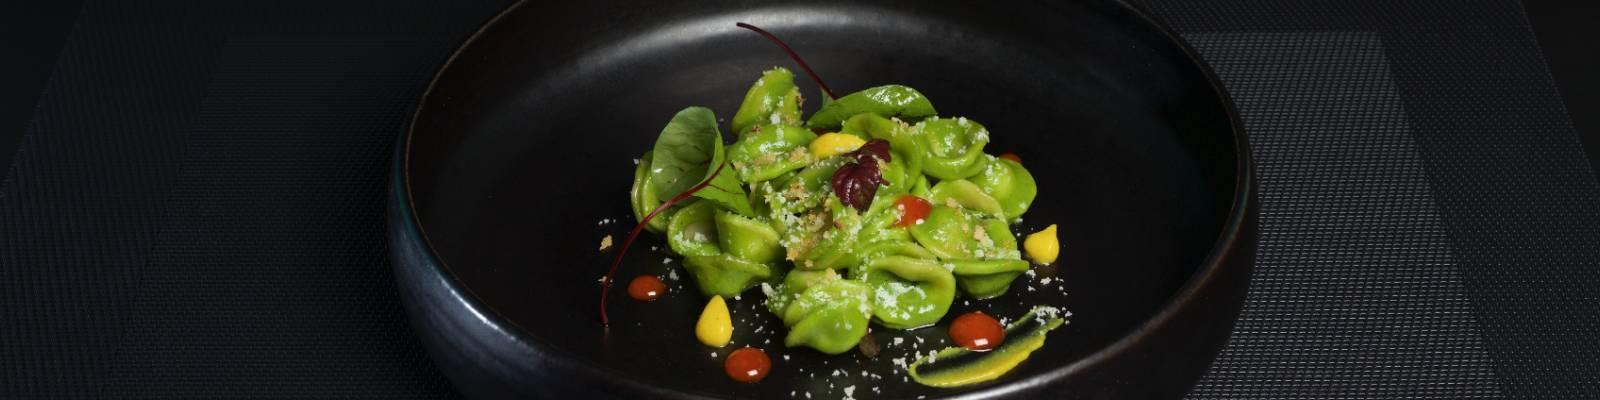 Pasta Garofalo - Orecchiette Garofalo au pesto, tocco speziato